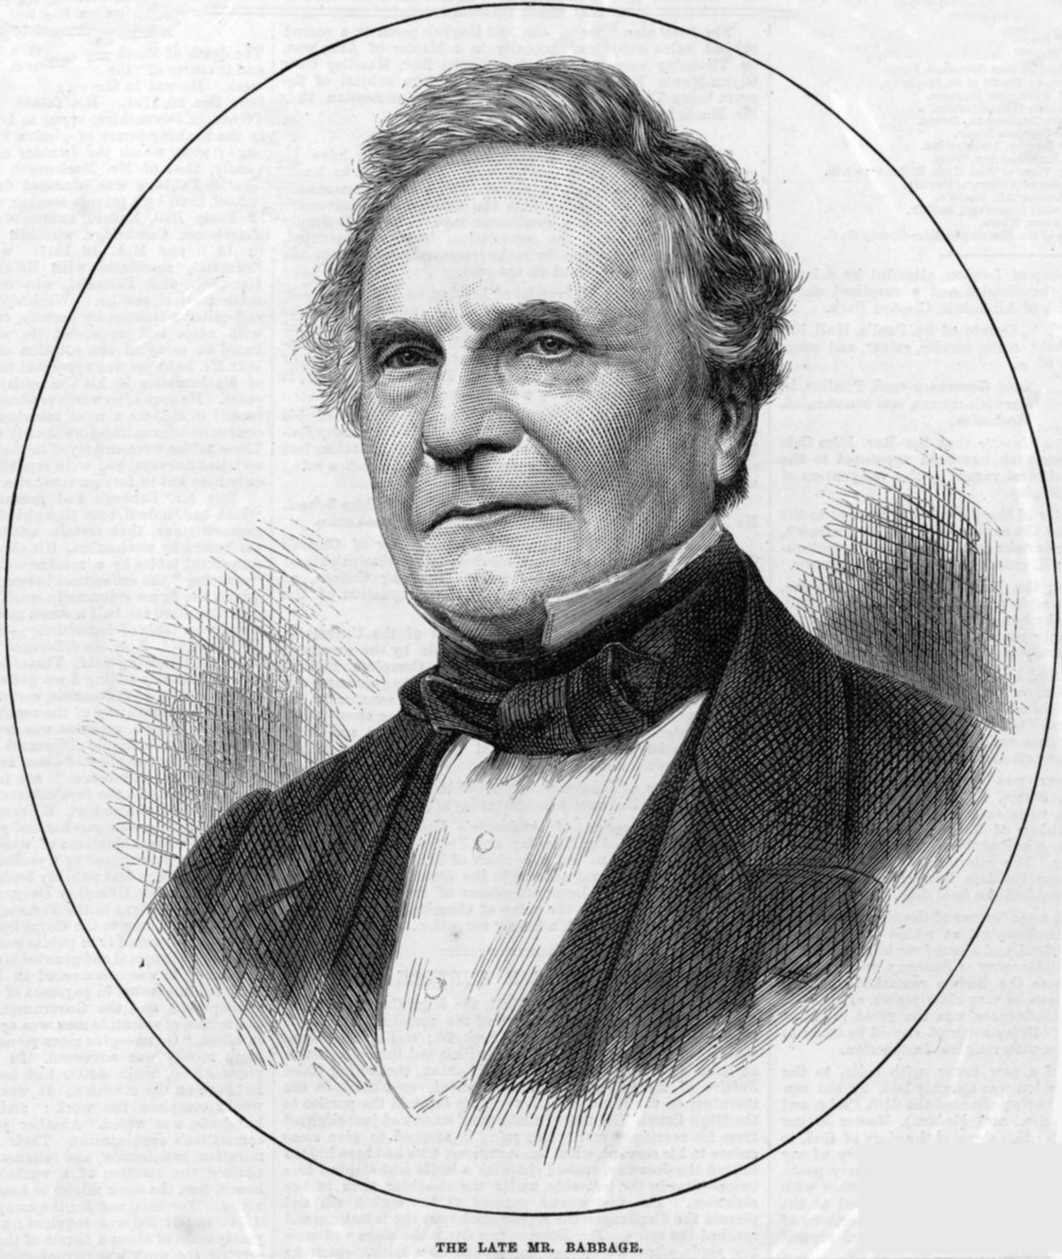 Ilustração de Charles Babbage em jornal inglês de 1871 (Foto: Wikimedia/Unknown staff artist for The Illustrated London News)